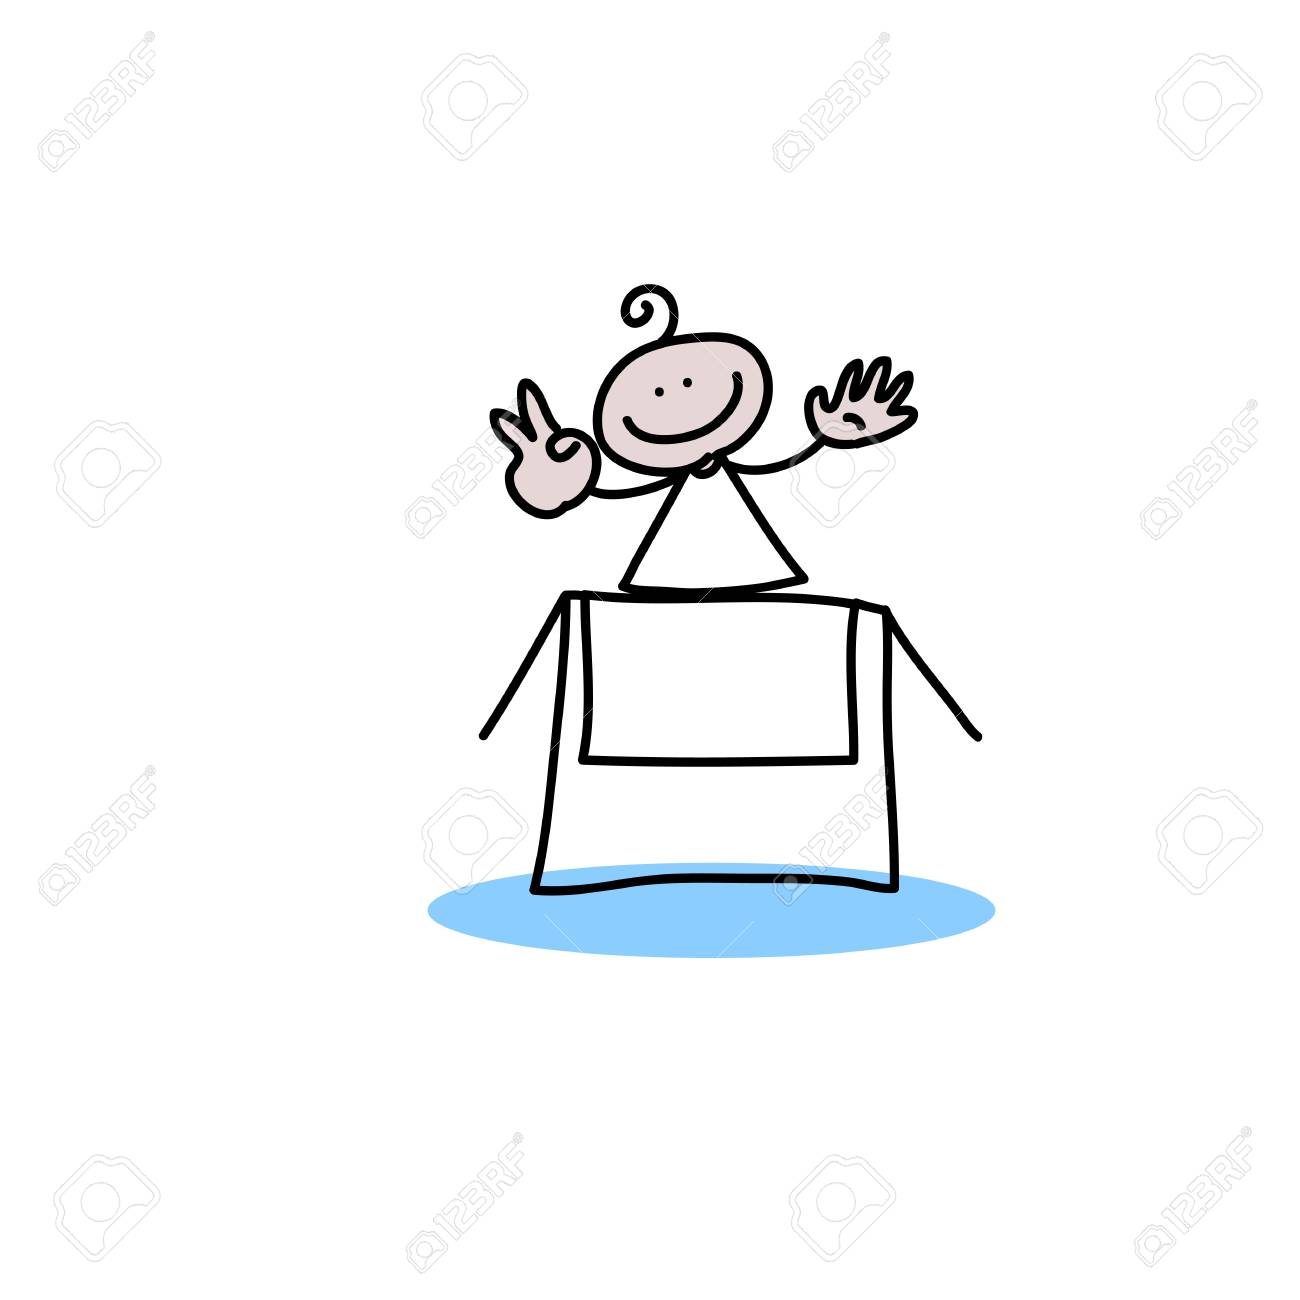 hand drawing cartoon characters creativity for presentation Stock Vector - 19140550